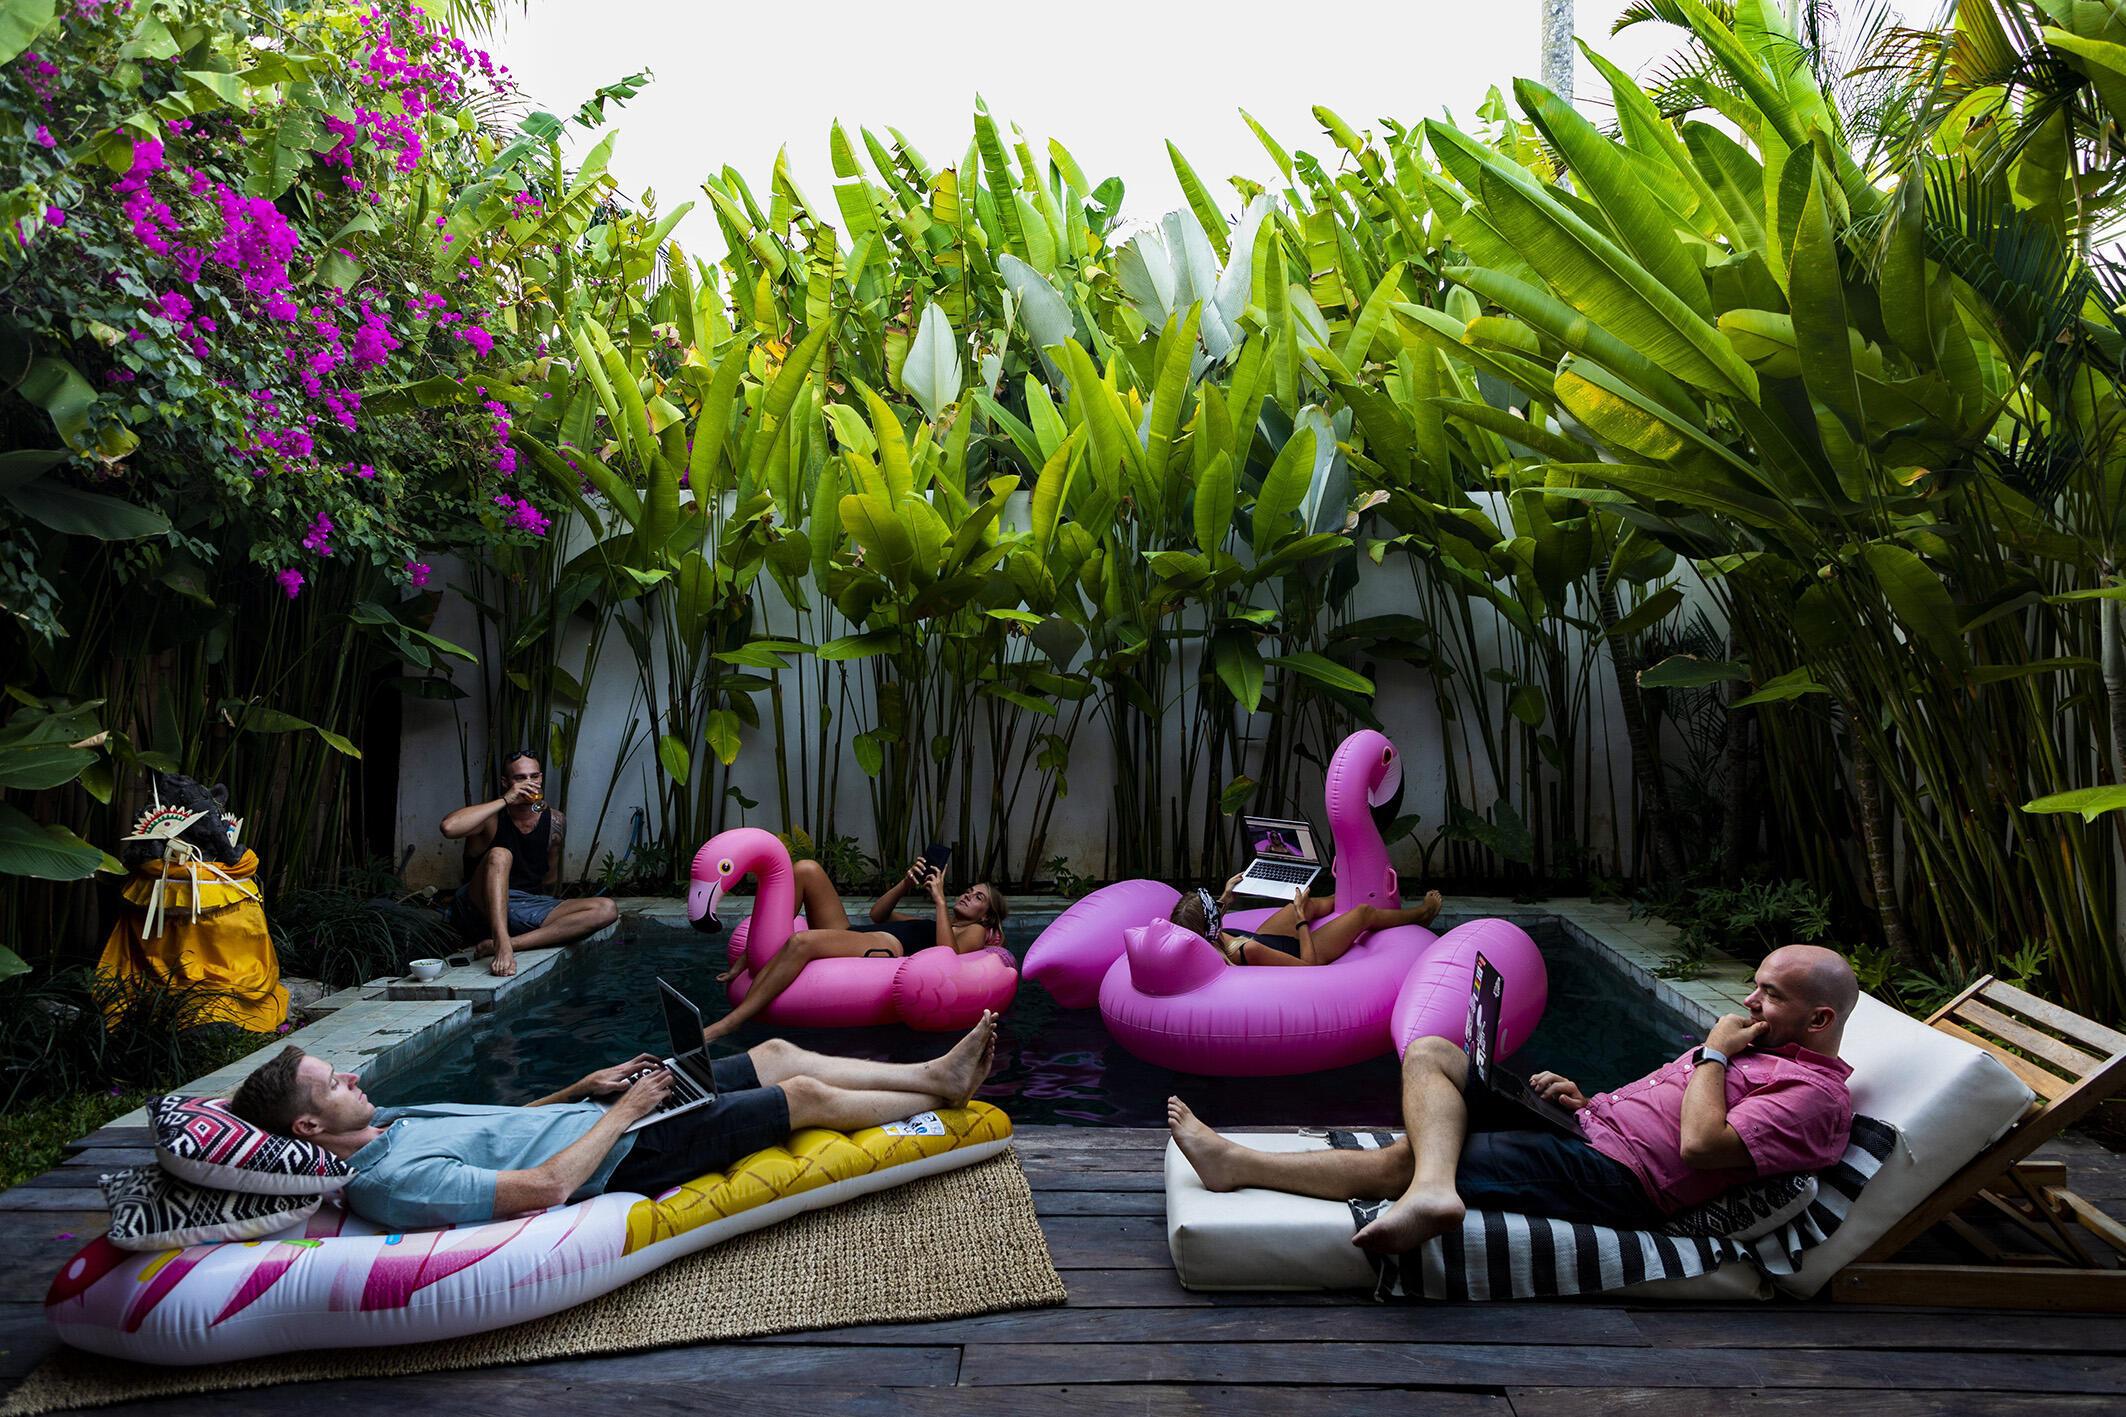 Gence-Teletravail_Nina lounging on the inflatable flamingo